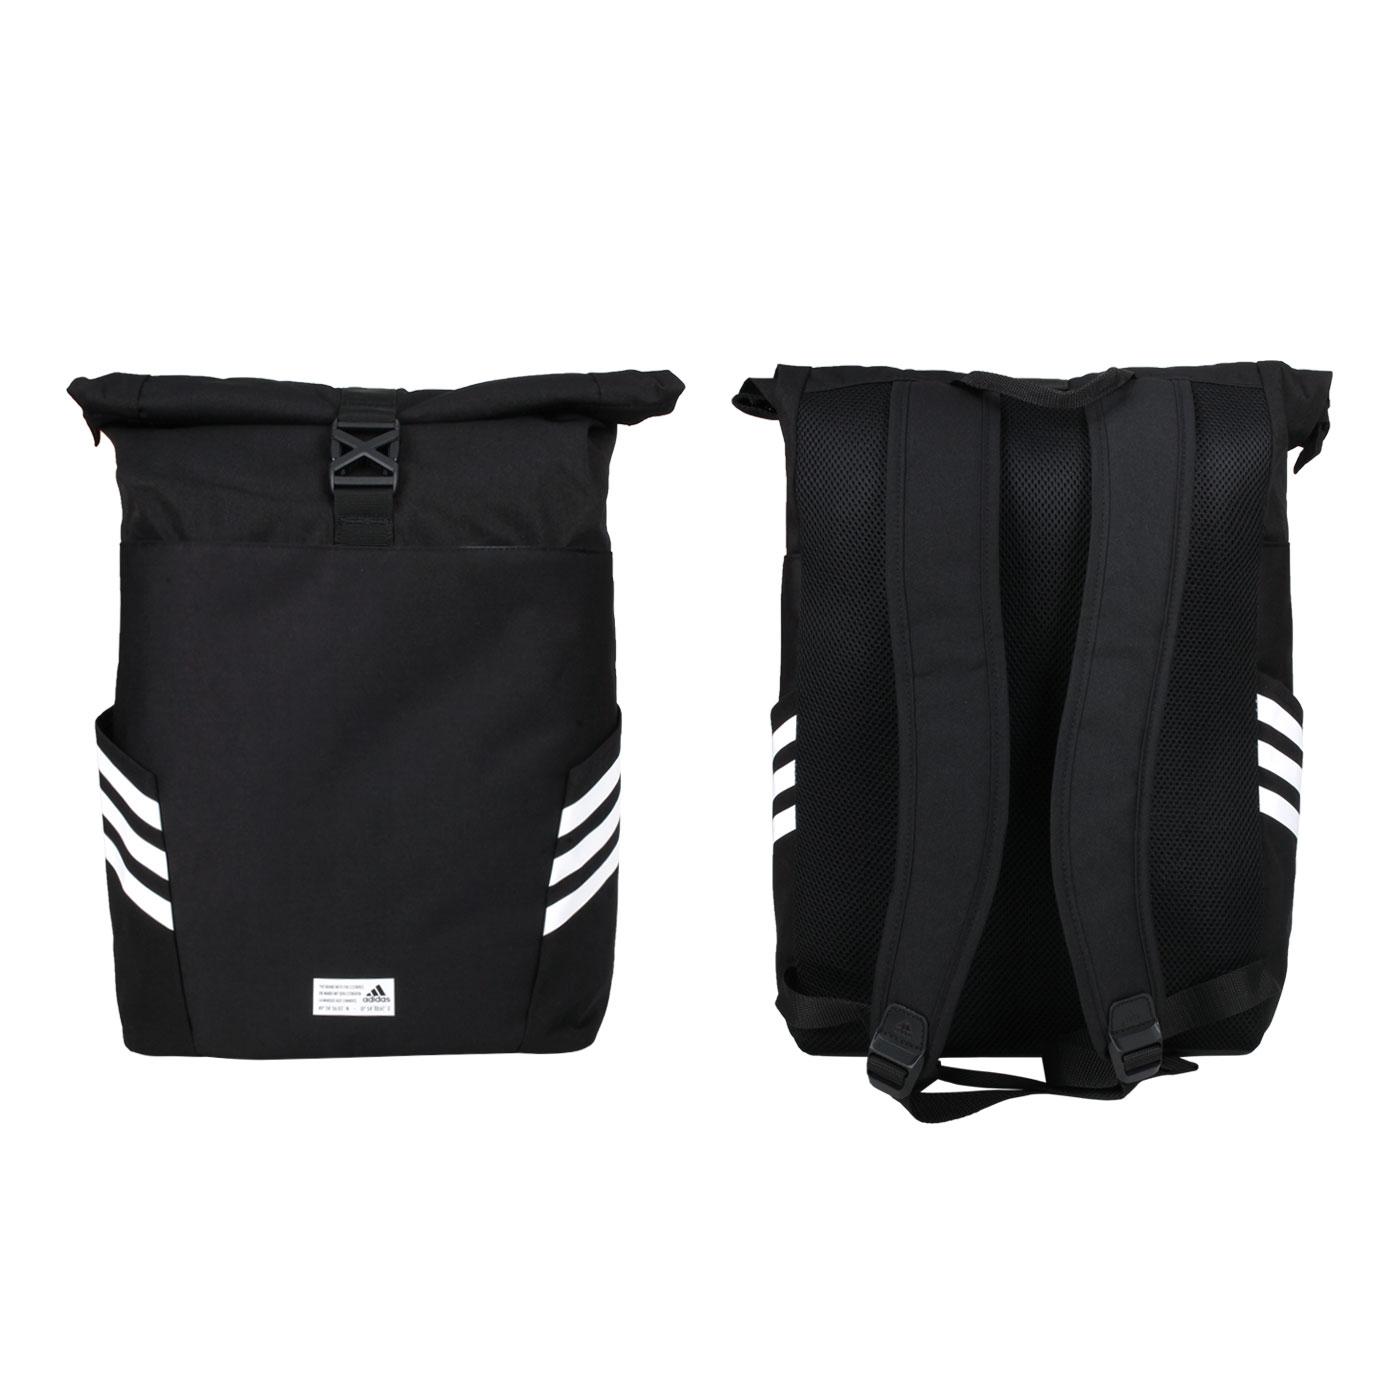 ADIDAS 捲疊式背包 GU0873 - 黑白